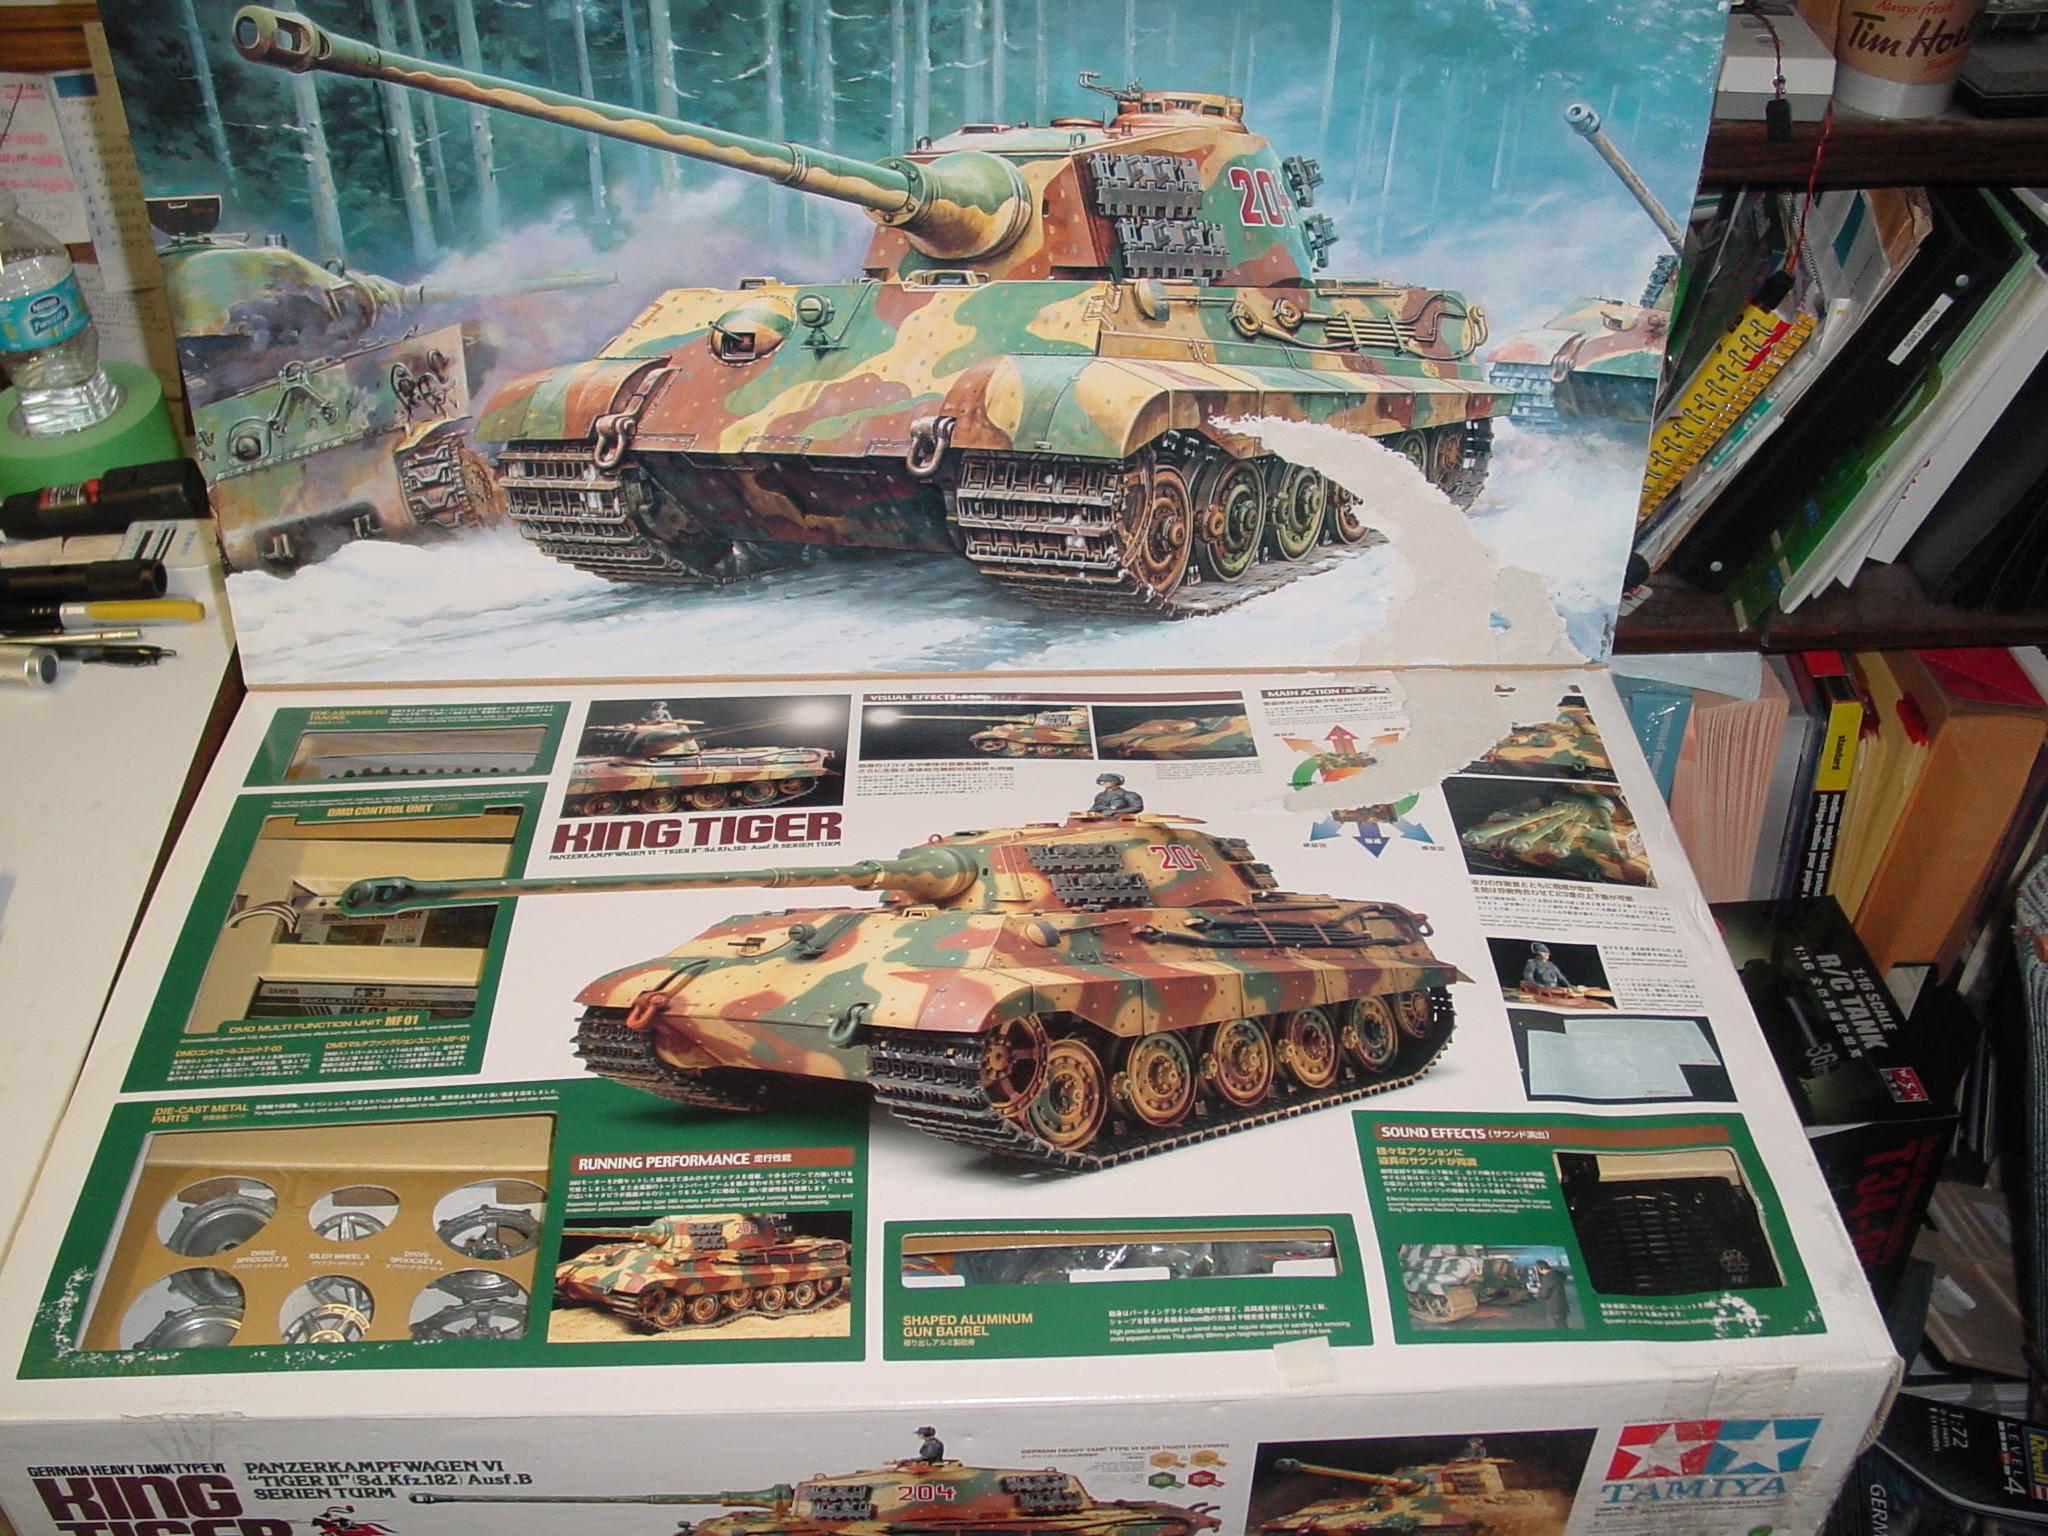 Unbuilt Tamiya 1/16 King Tiger Tank for Sale Dsc00028